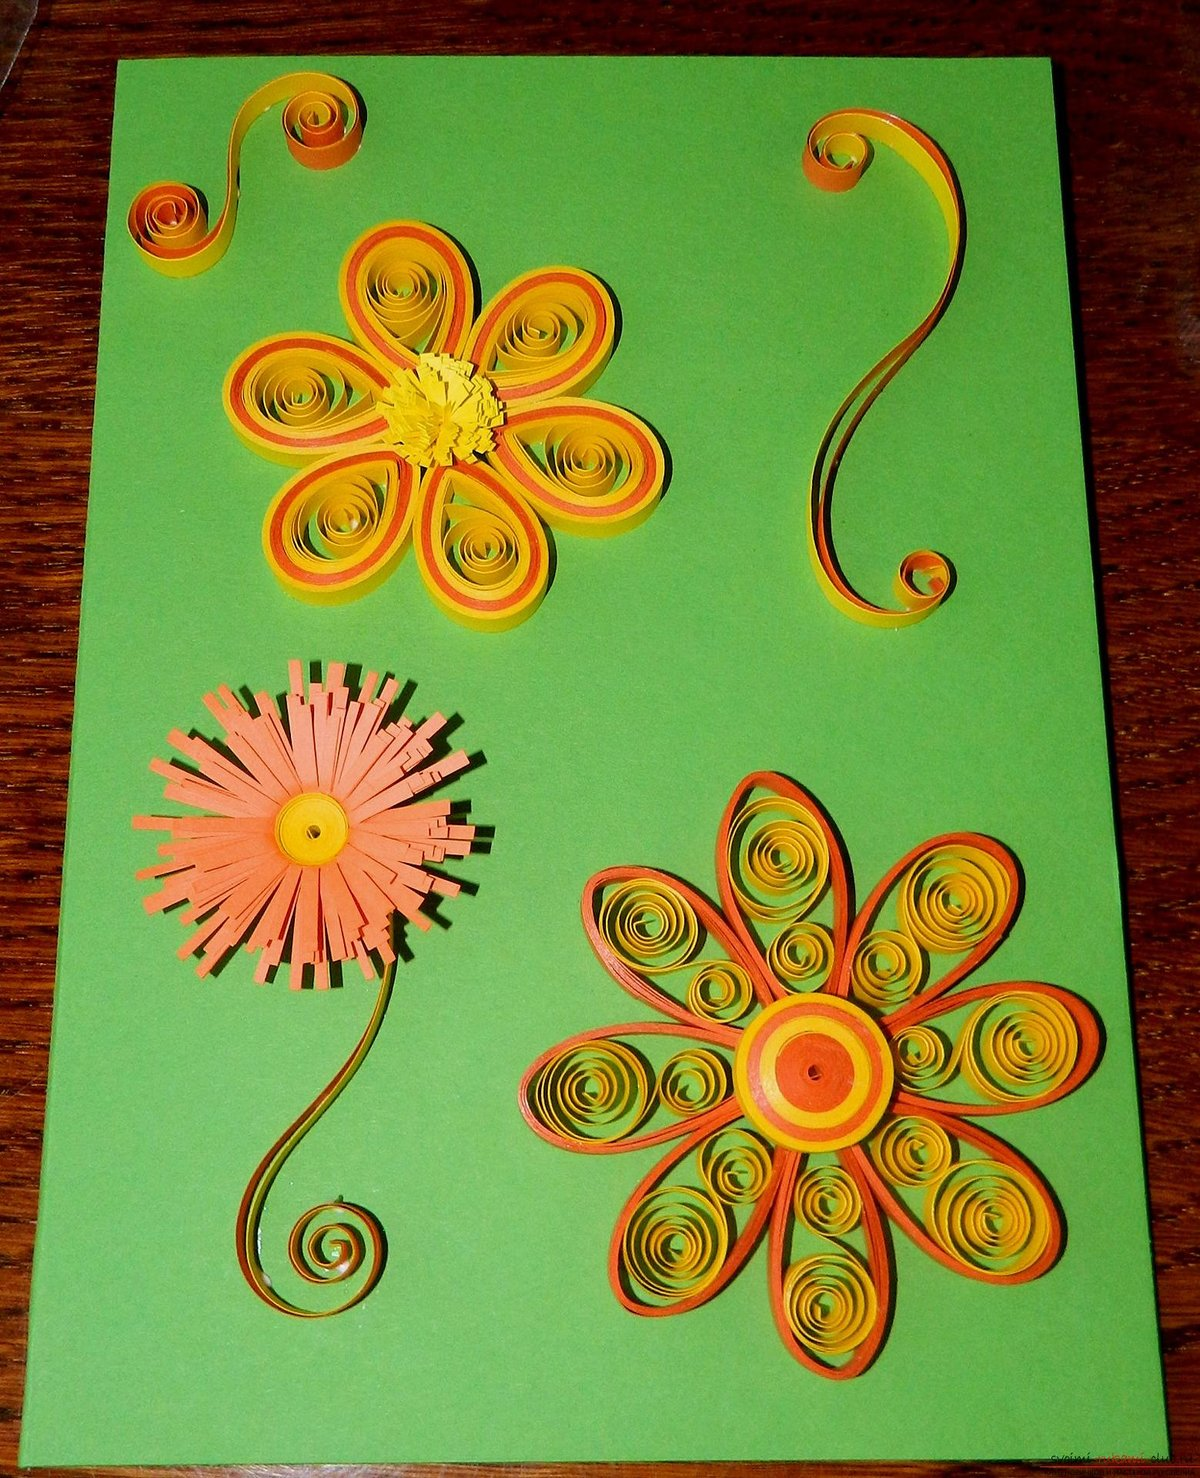 Февраля картинки, открытка цветы квиллинг